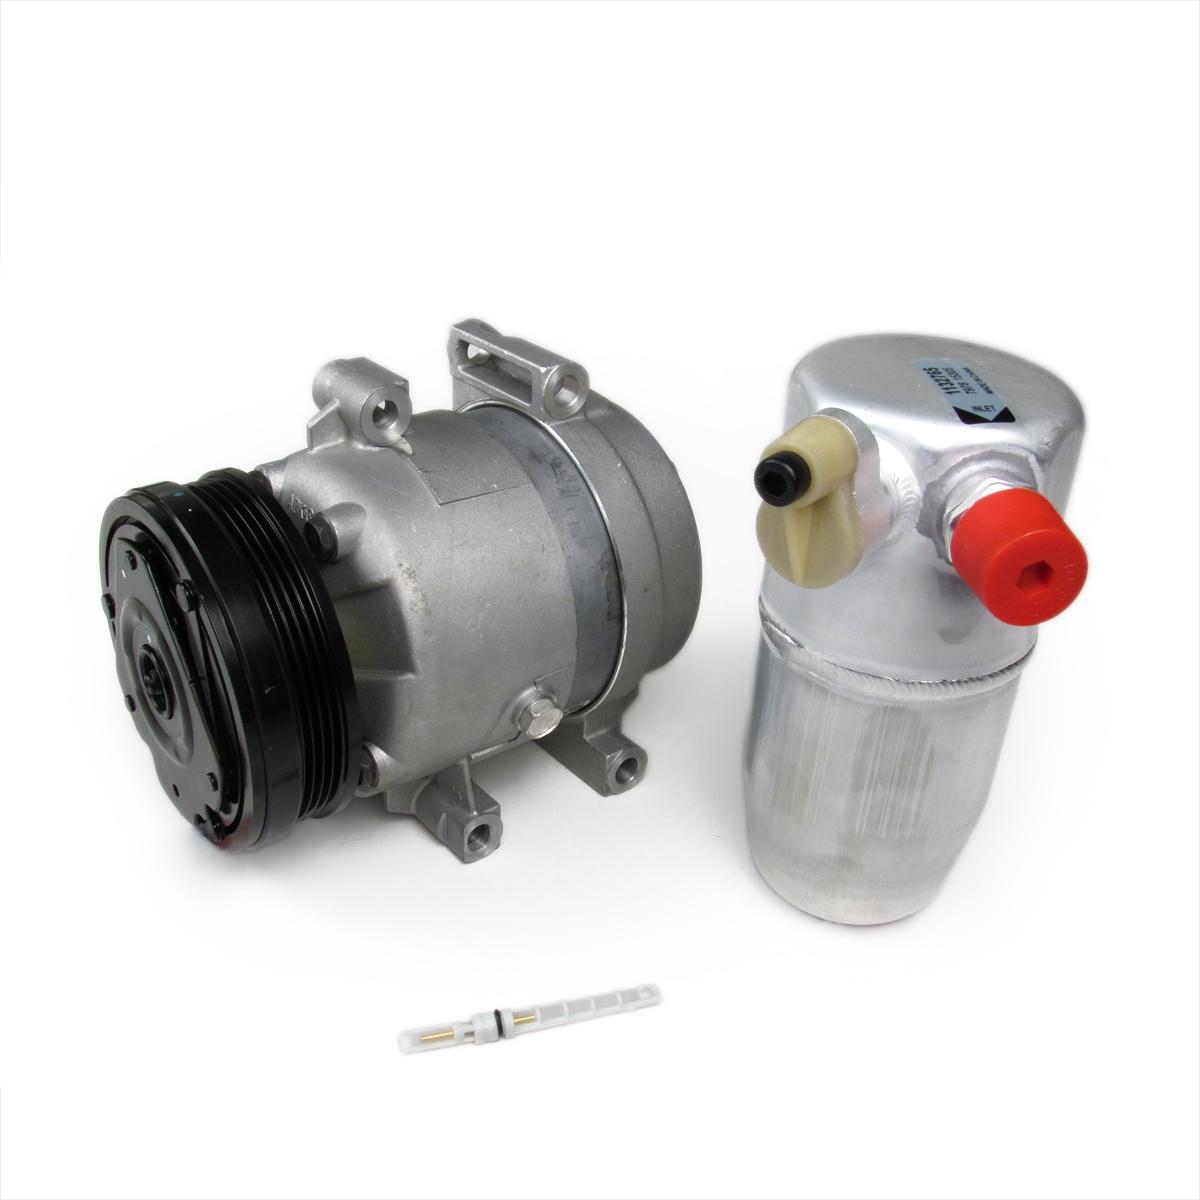 Ac Auto Parts >> Ac Compressor Accumulator And Orifice Tube Gm Part Nos 89018958 1132765 3033879 15 20746 1520746 01137031